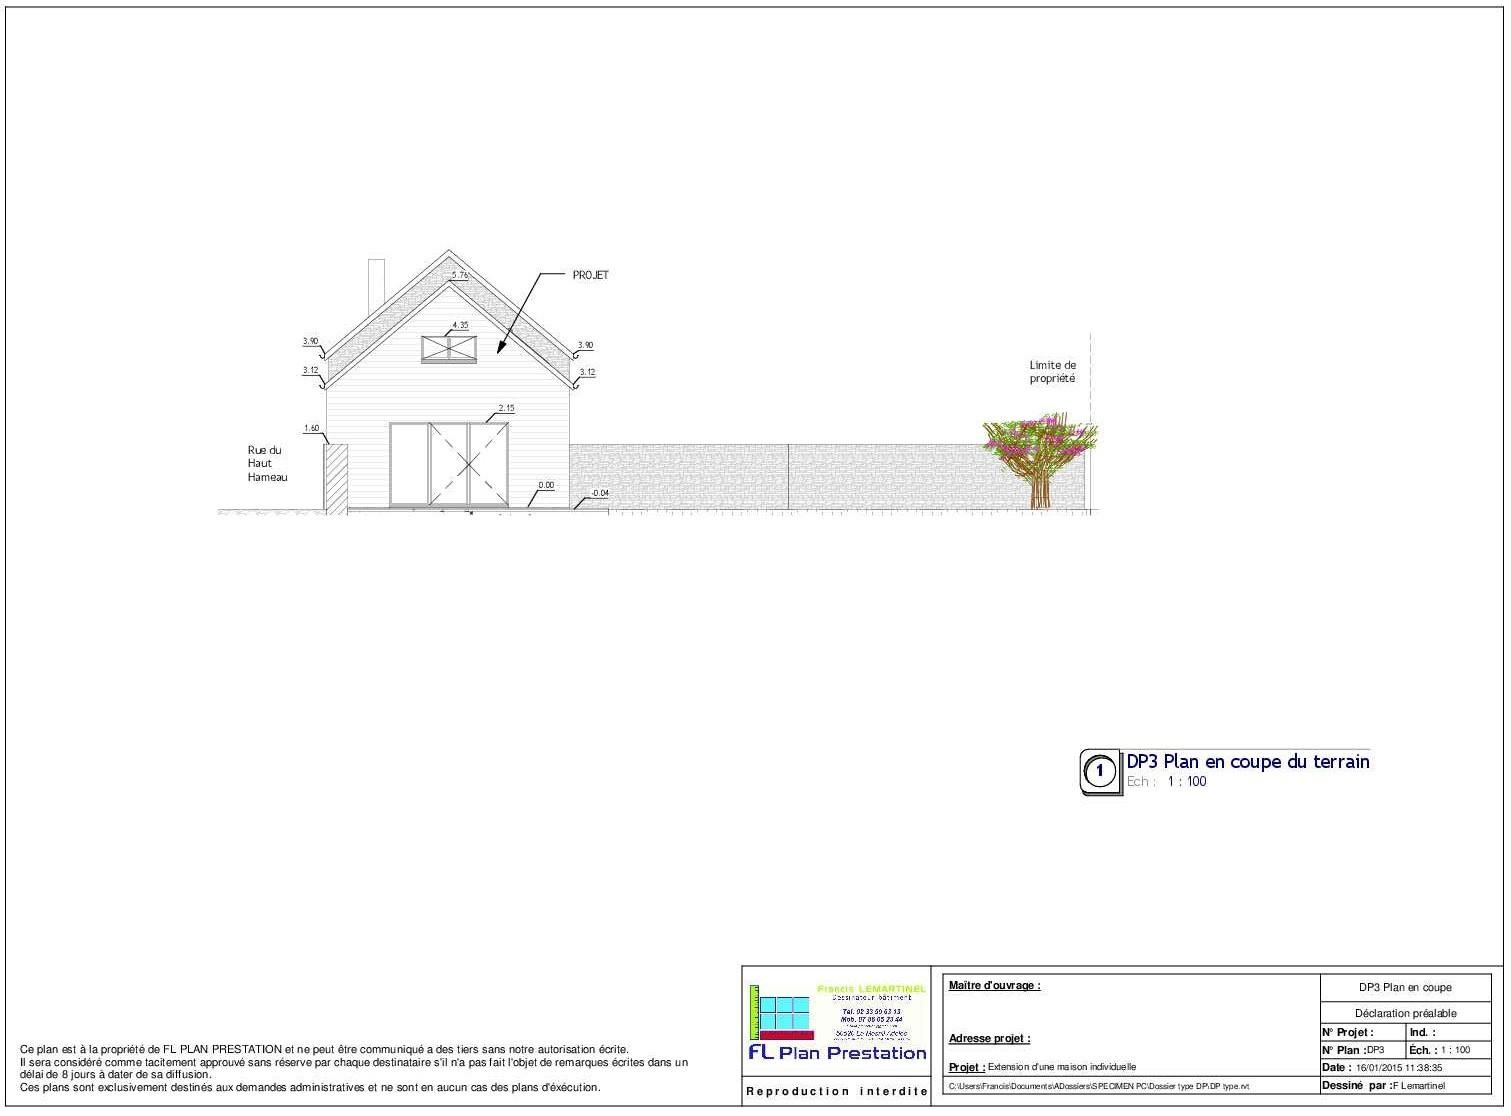 dossier type de permis de construire r alis par fl plan prestation fl plan prestation. Black Bedroom Furniture Sets. Home Design Ideas